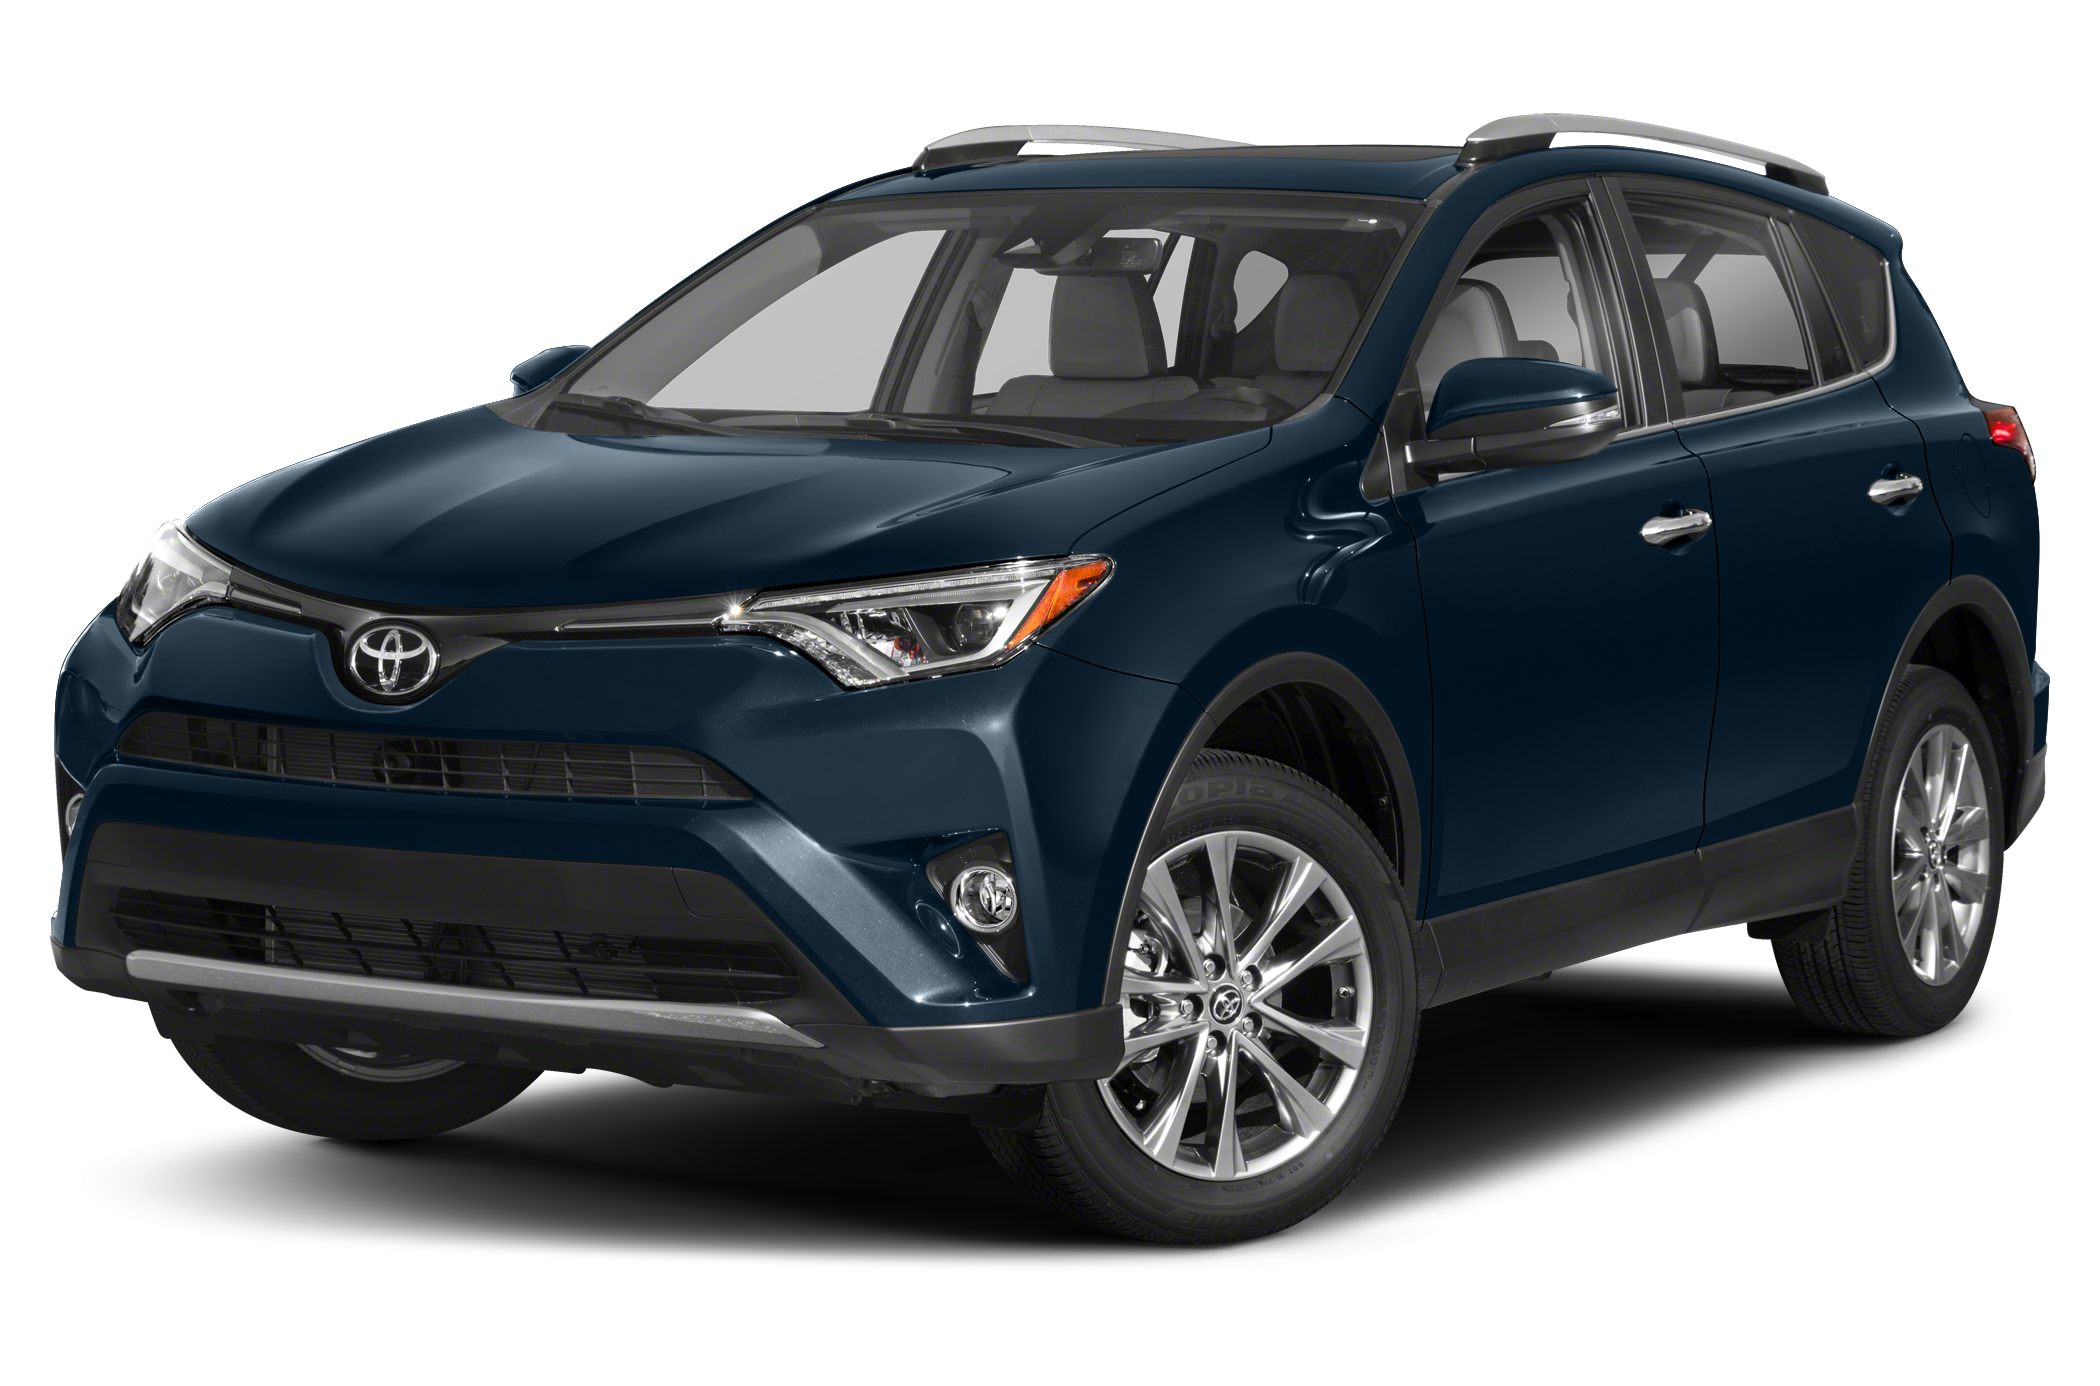 2018 Toyota RAV4 Platinum 4dr All-wheel Drive